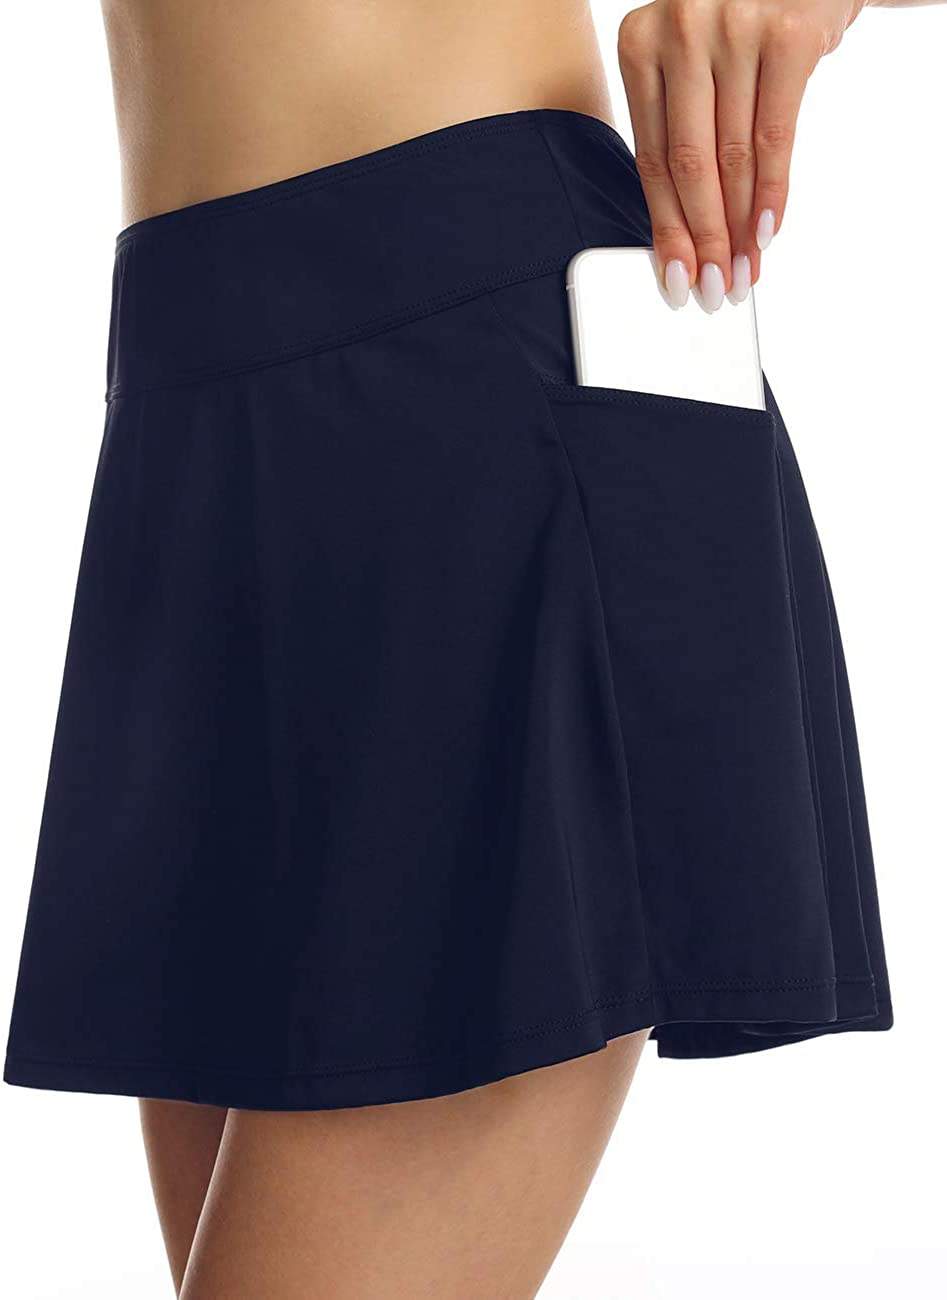 Septangle Women's Swim Skirts Tankini Bottom with Side Pocket Swimsuit